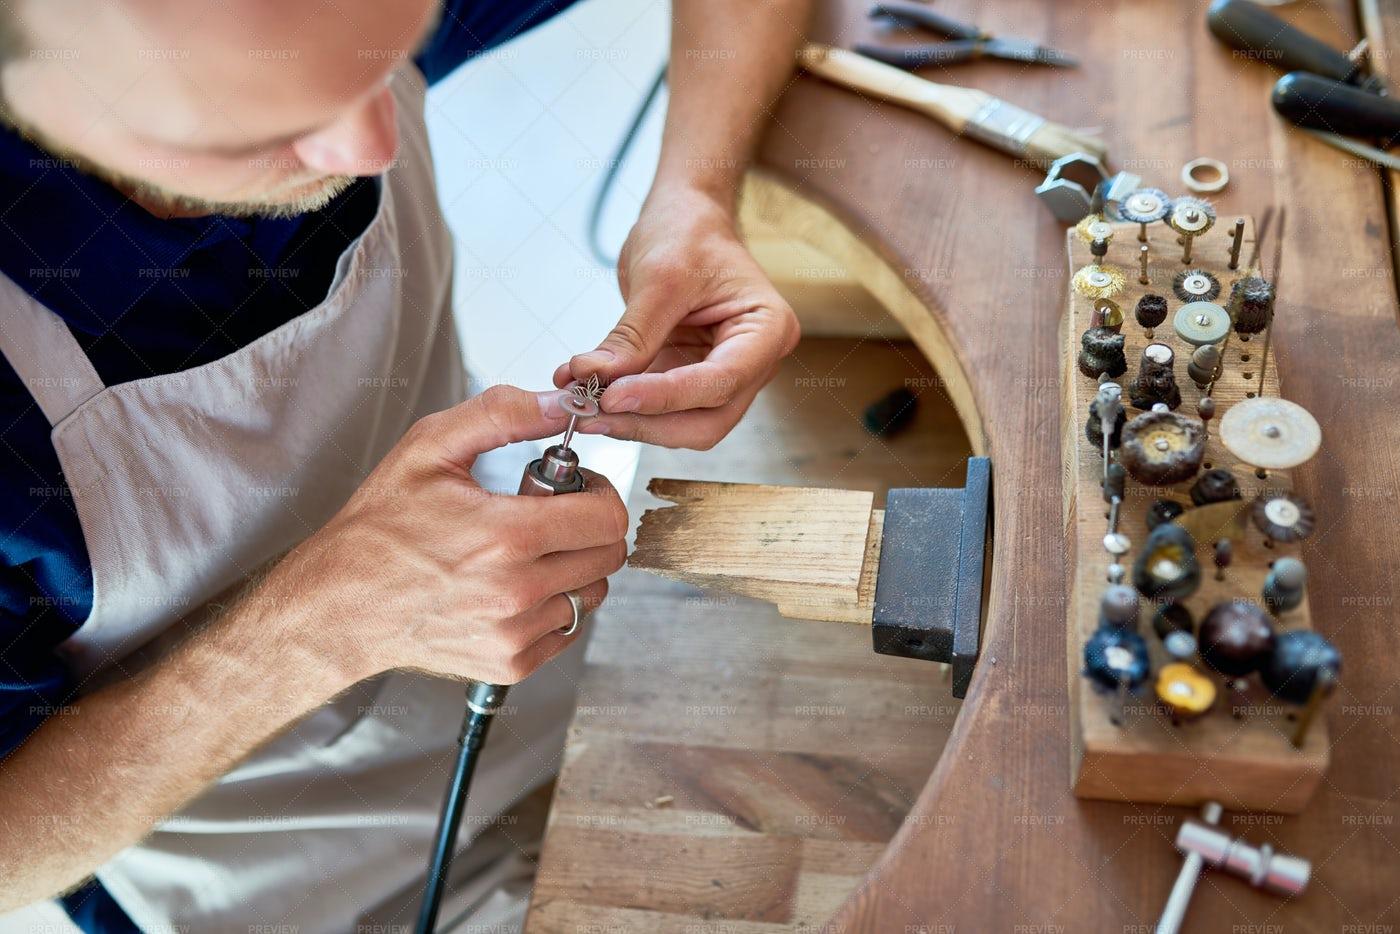 Artisan Making Jewelry In Workshop: Stock Photos